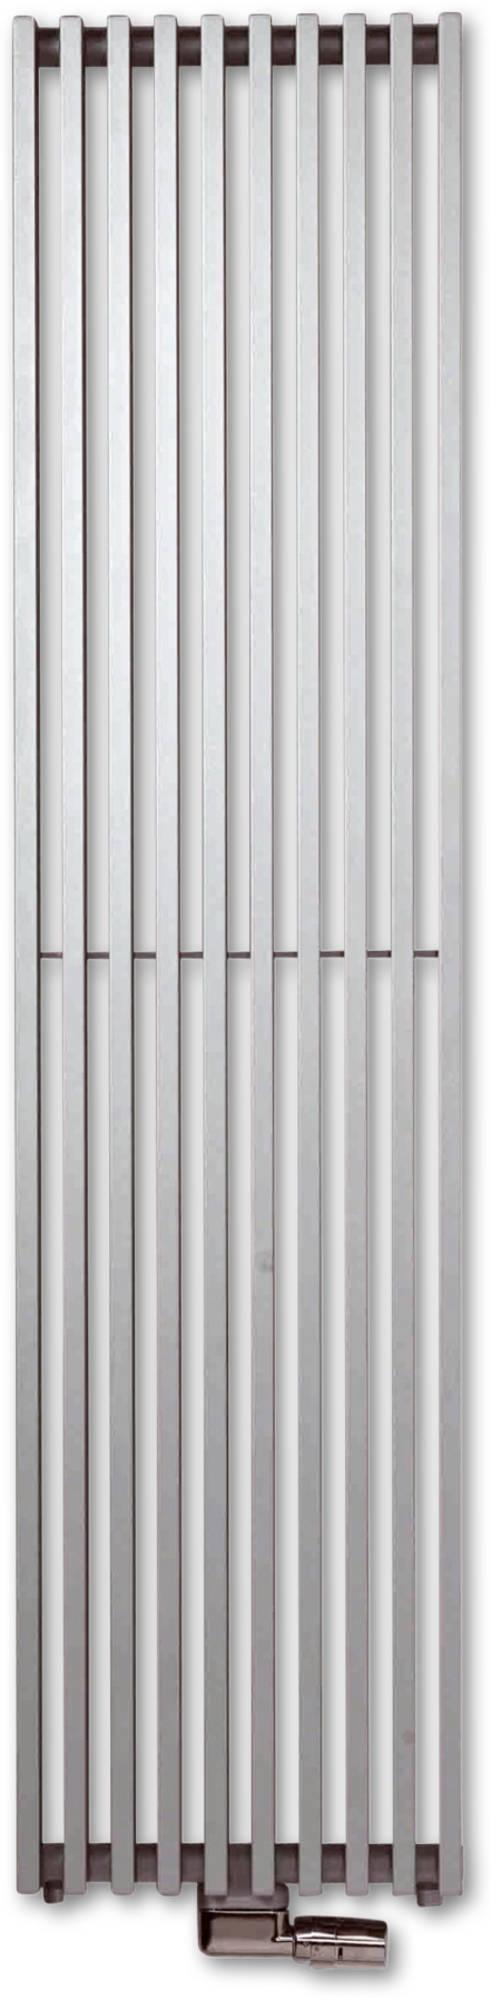 Vasco Zana ZV-1 design radiator 624x1800 n16 1719w as=1188 Wit RAL 9016